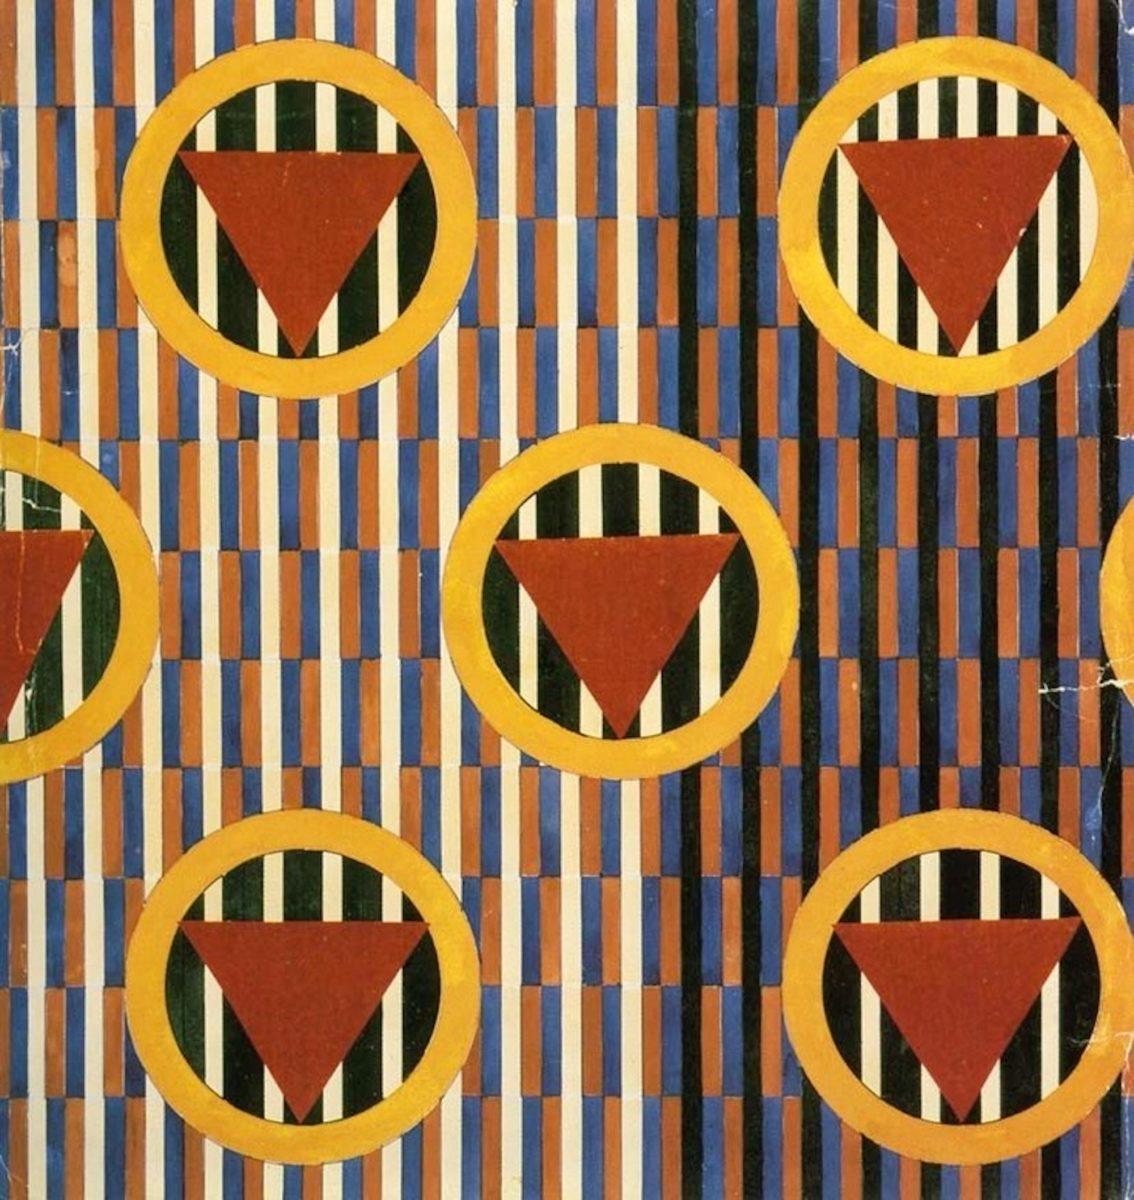 Lyubov Popova, Textile design (early 1920s) (3)